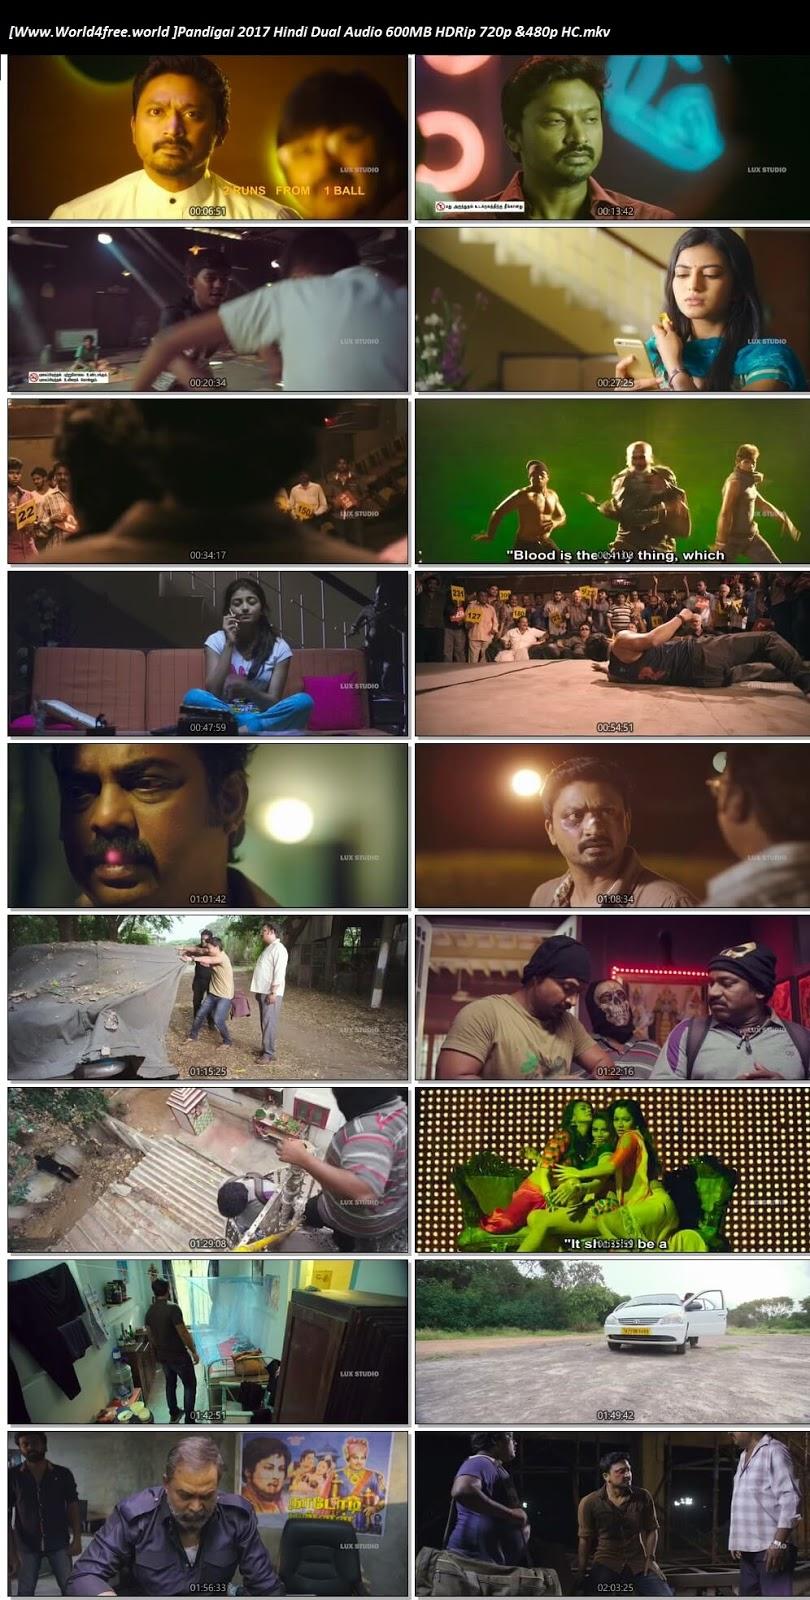 Screen Shoot of Pandigai 2017 Hindi Dual Audio 600MB HDRip 720p HC